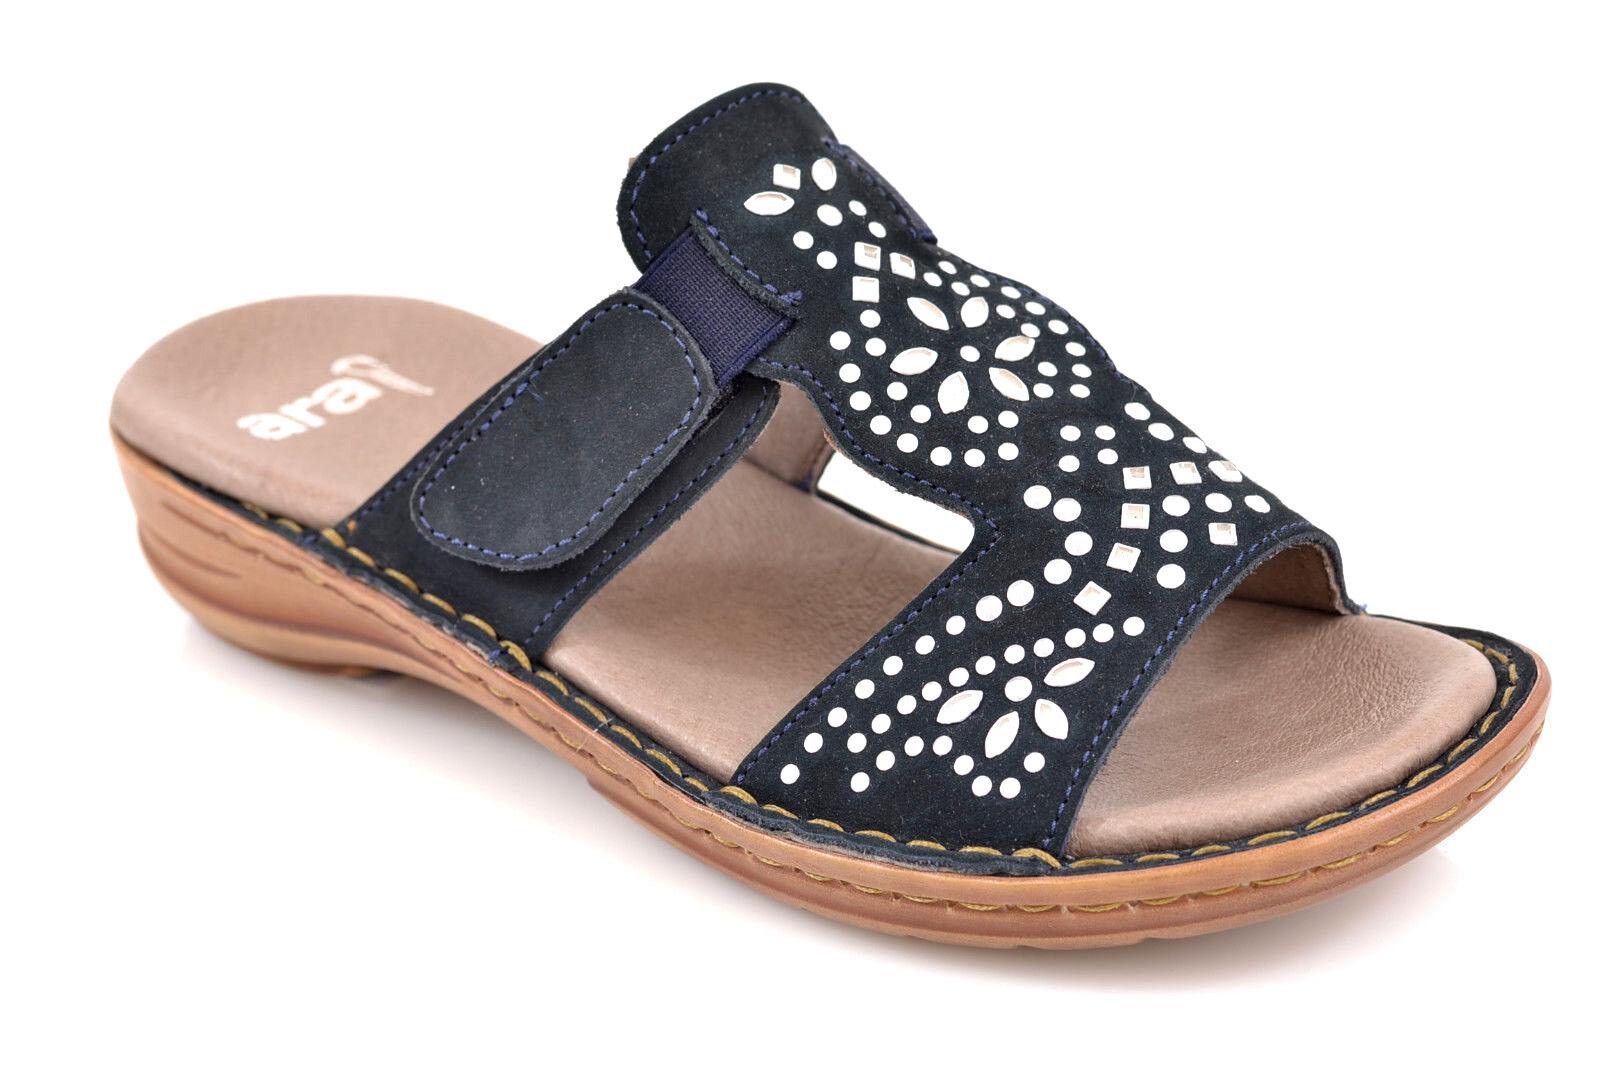 Pantolette Ara Hawaii Gr.37 Damen Pantolette Sandaleette blau  NEU ROTUZIERT